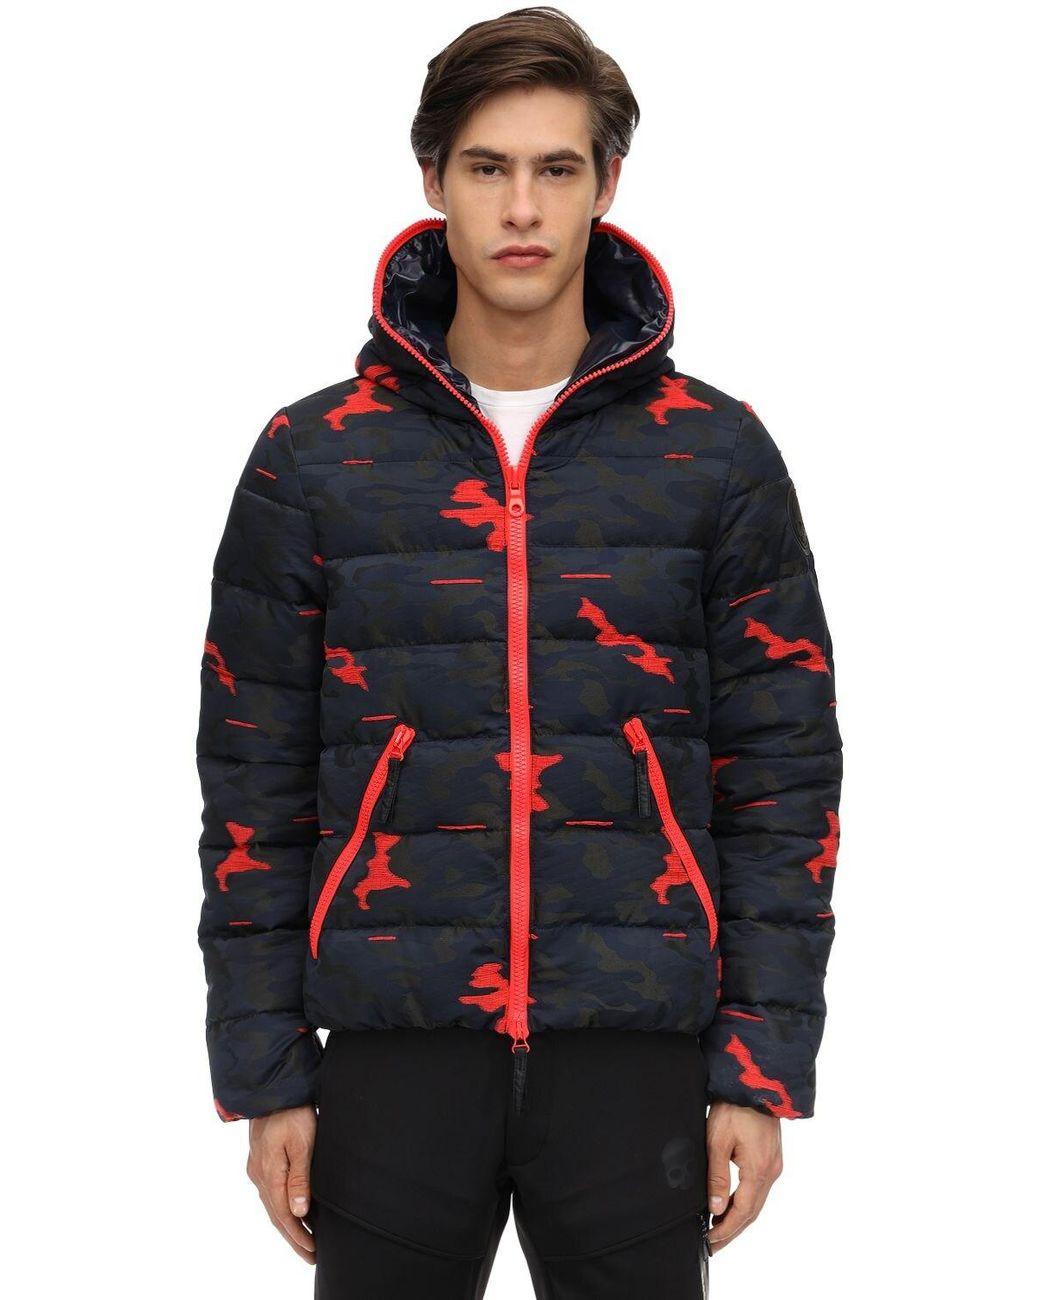 premium selection d6023 748ba Men's Duvetica Dionisio Printed Down Jacket